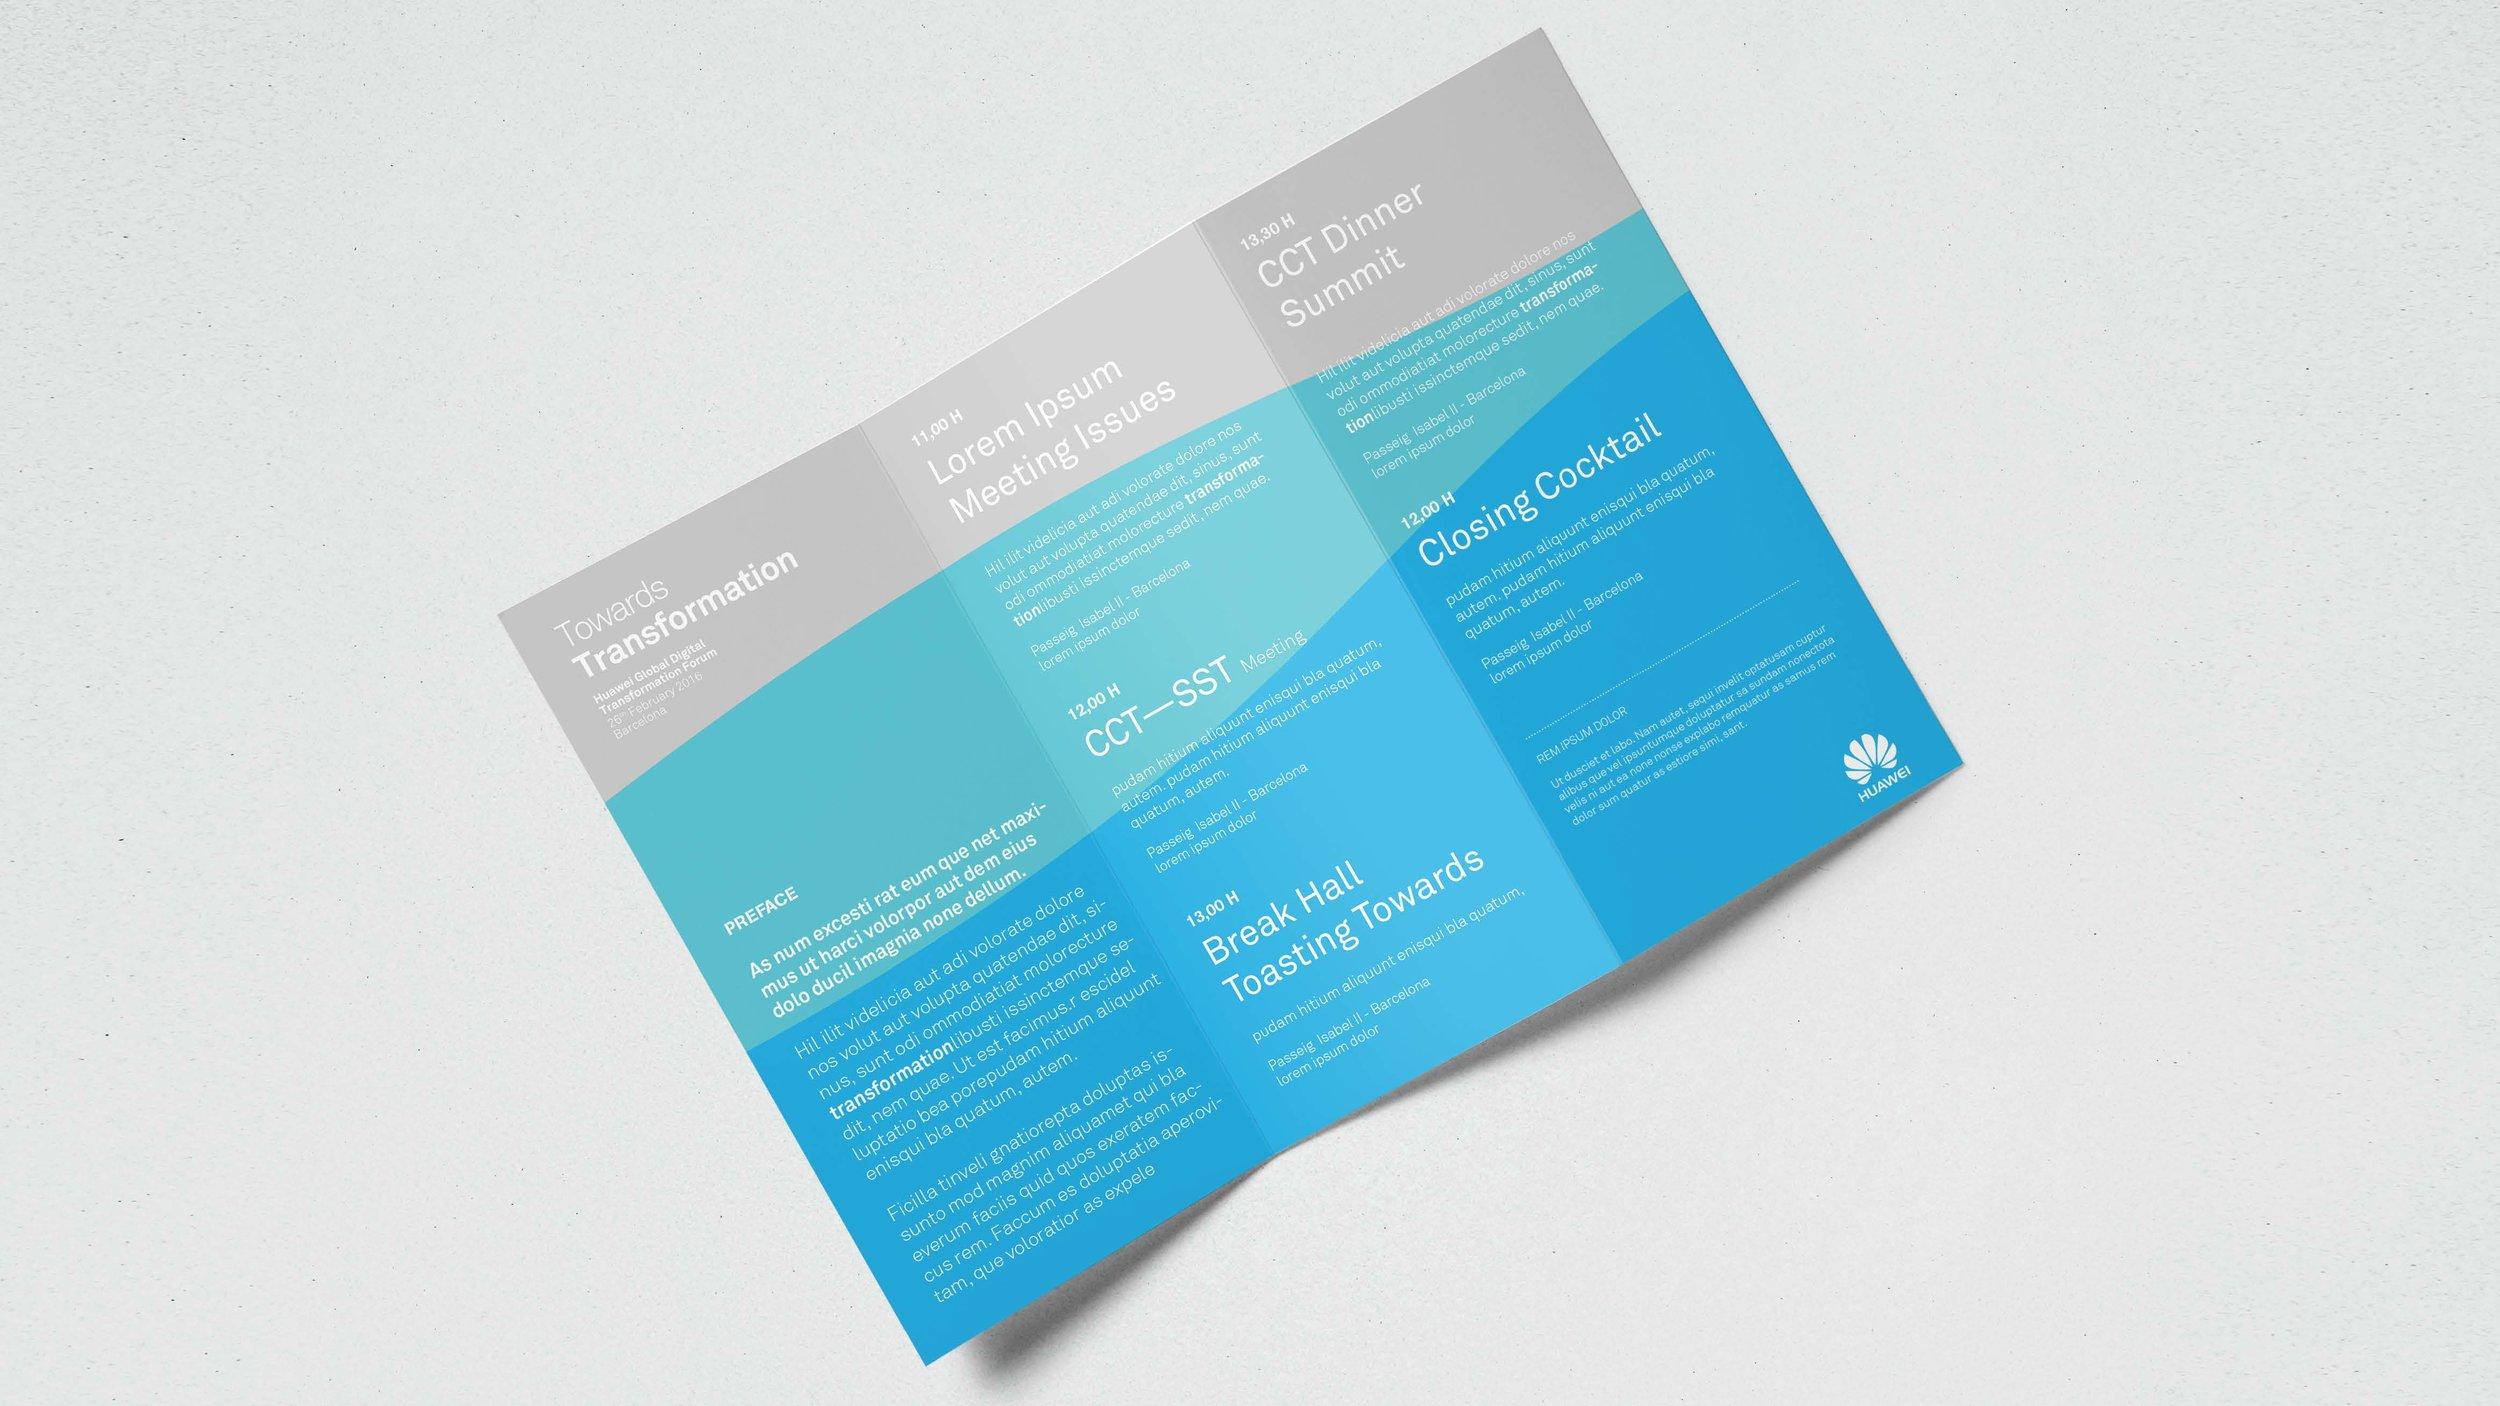 HUAWEI_Day+0_Huawei+Global+Digital+Transformation+Forum_v.1_Page_08.jpg